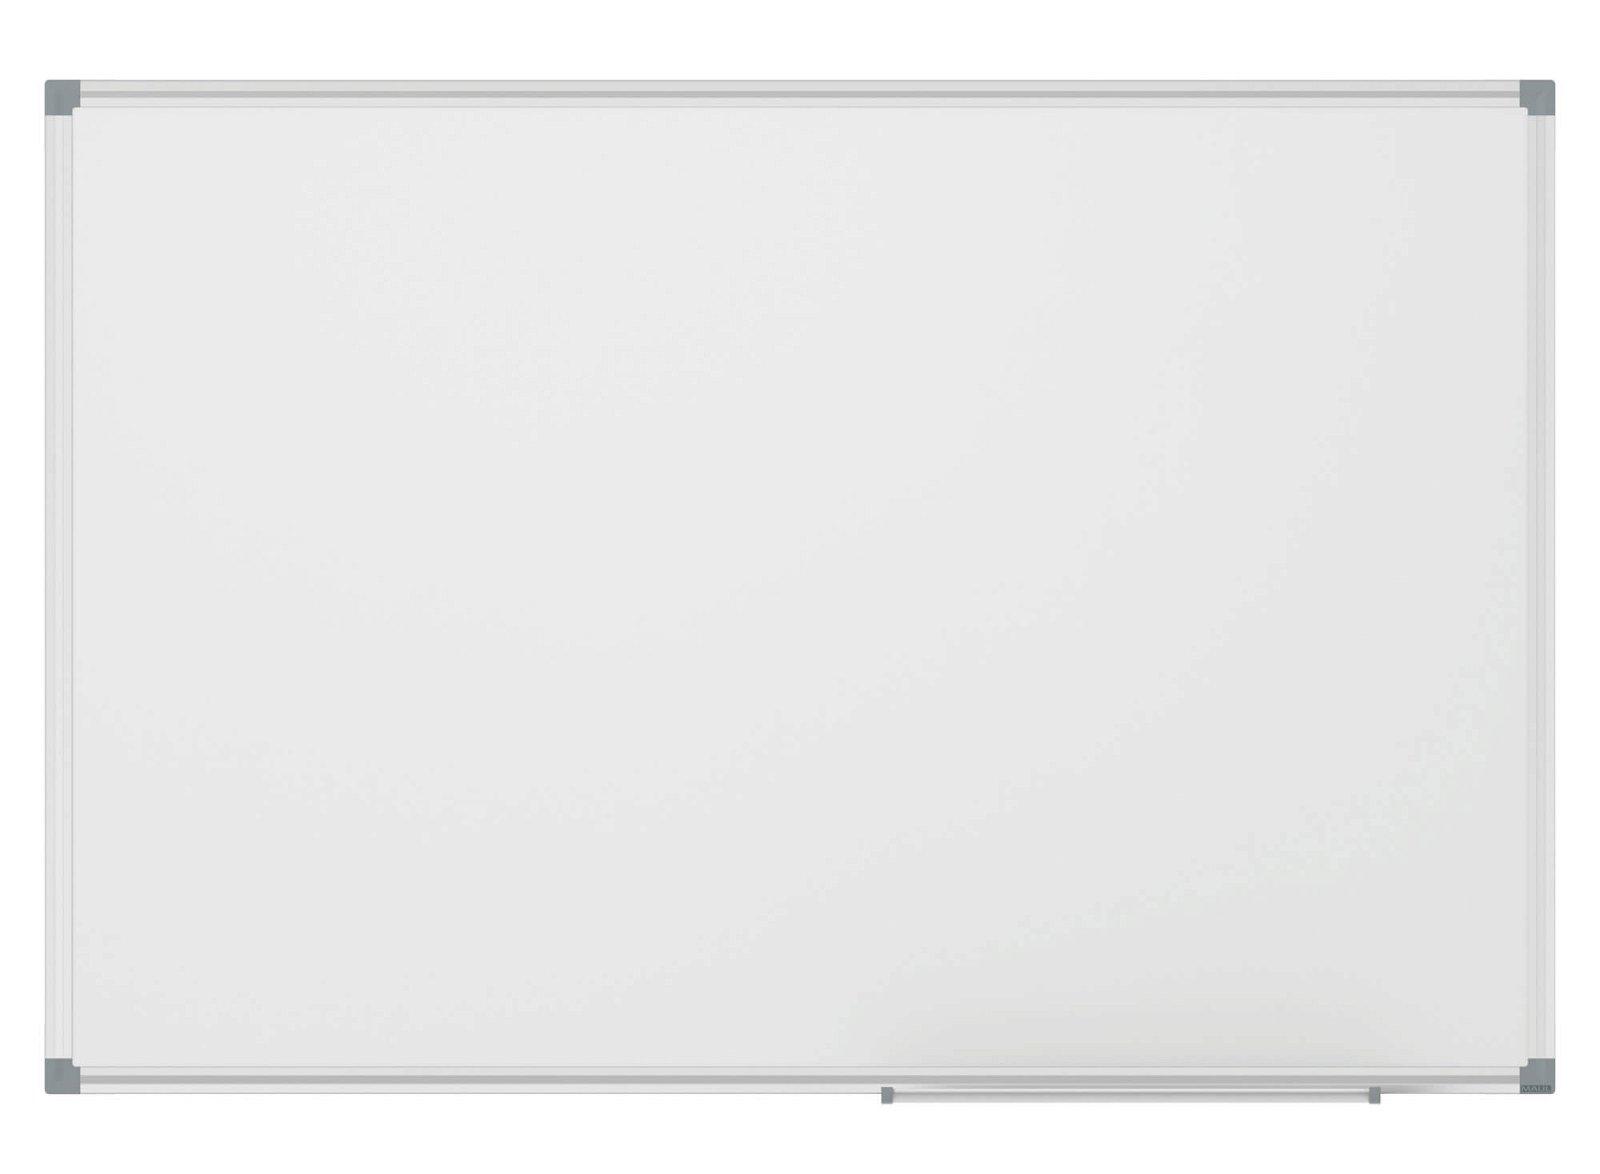 Whiteboard MAULstandard, Emaille, 45x60 cm, grau